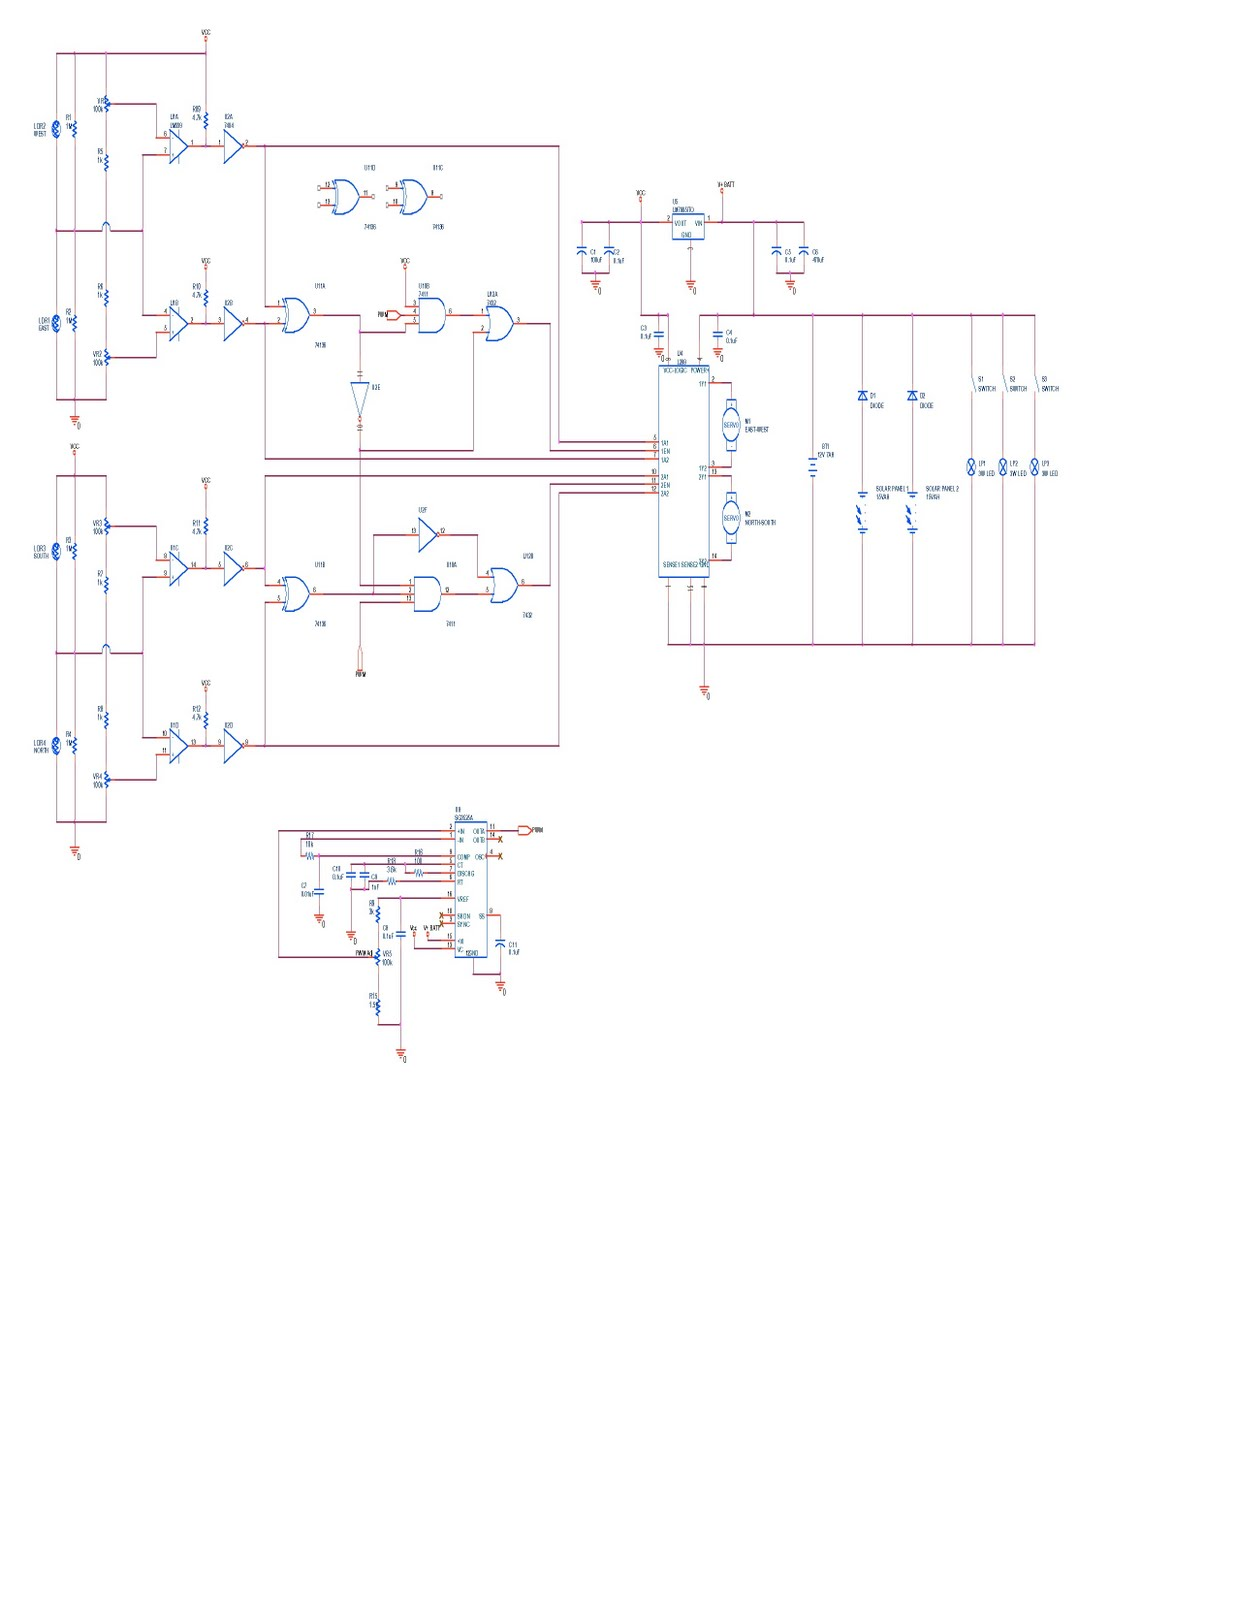 hight resolution of gainamplifier1 amplifiercircuit circuit diagram seekiccom data coaxial cable driver circuit diagram tradeoficcom